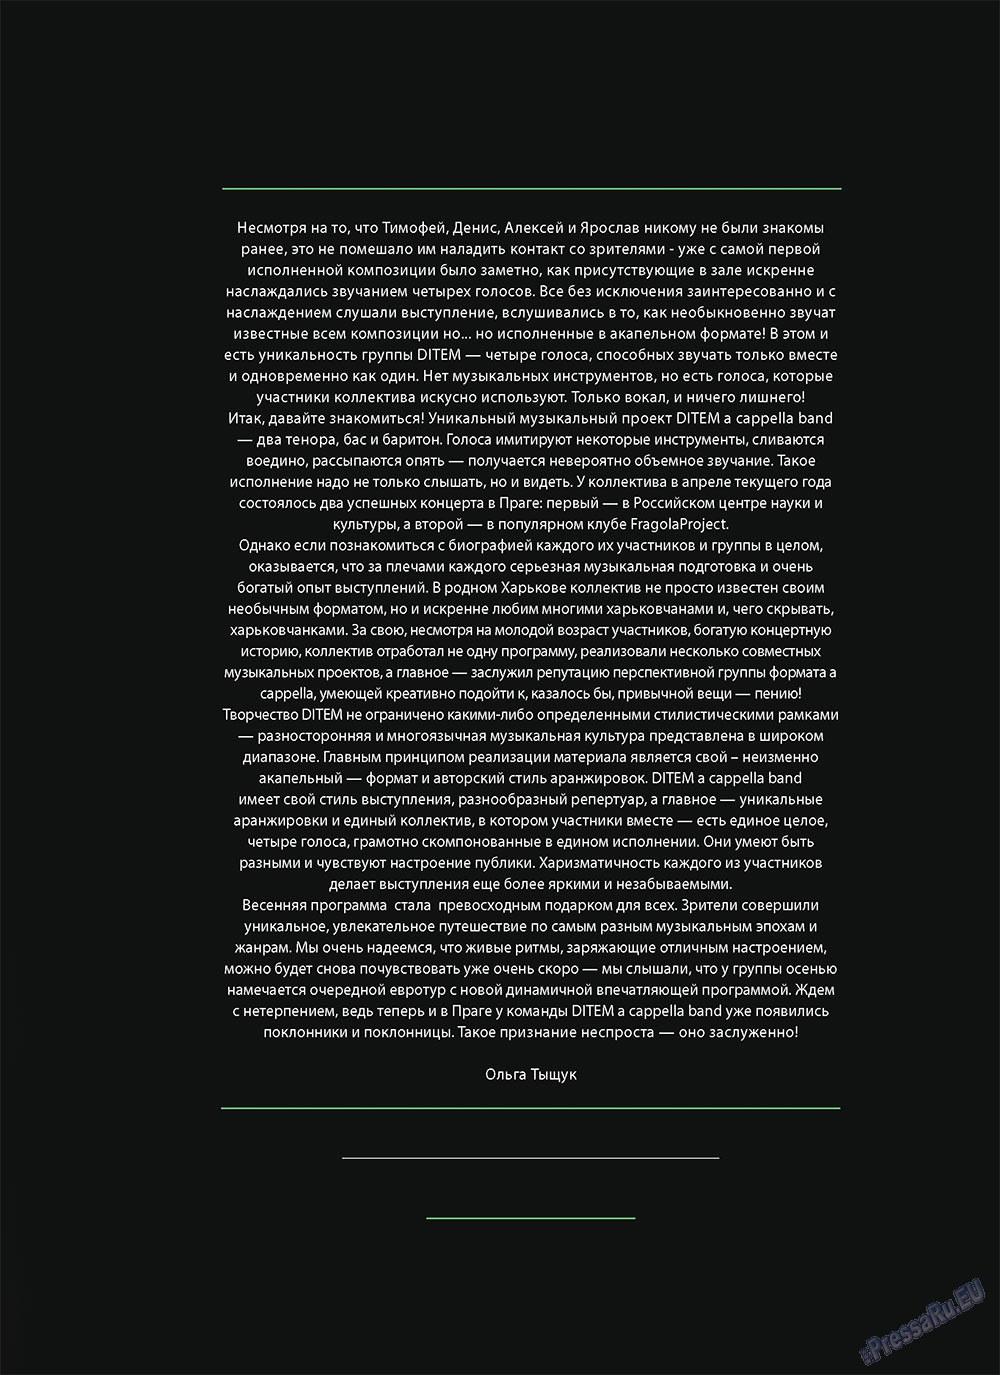 Артек (журнал). 2011 год, номер 2, стр. 7